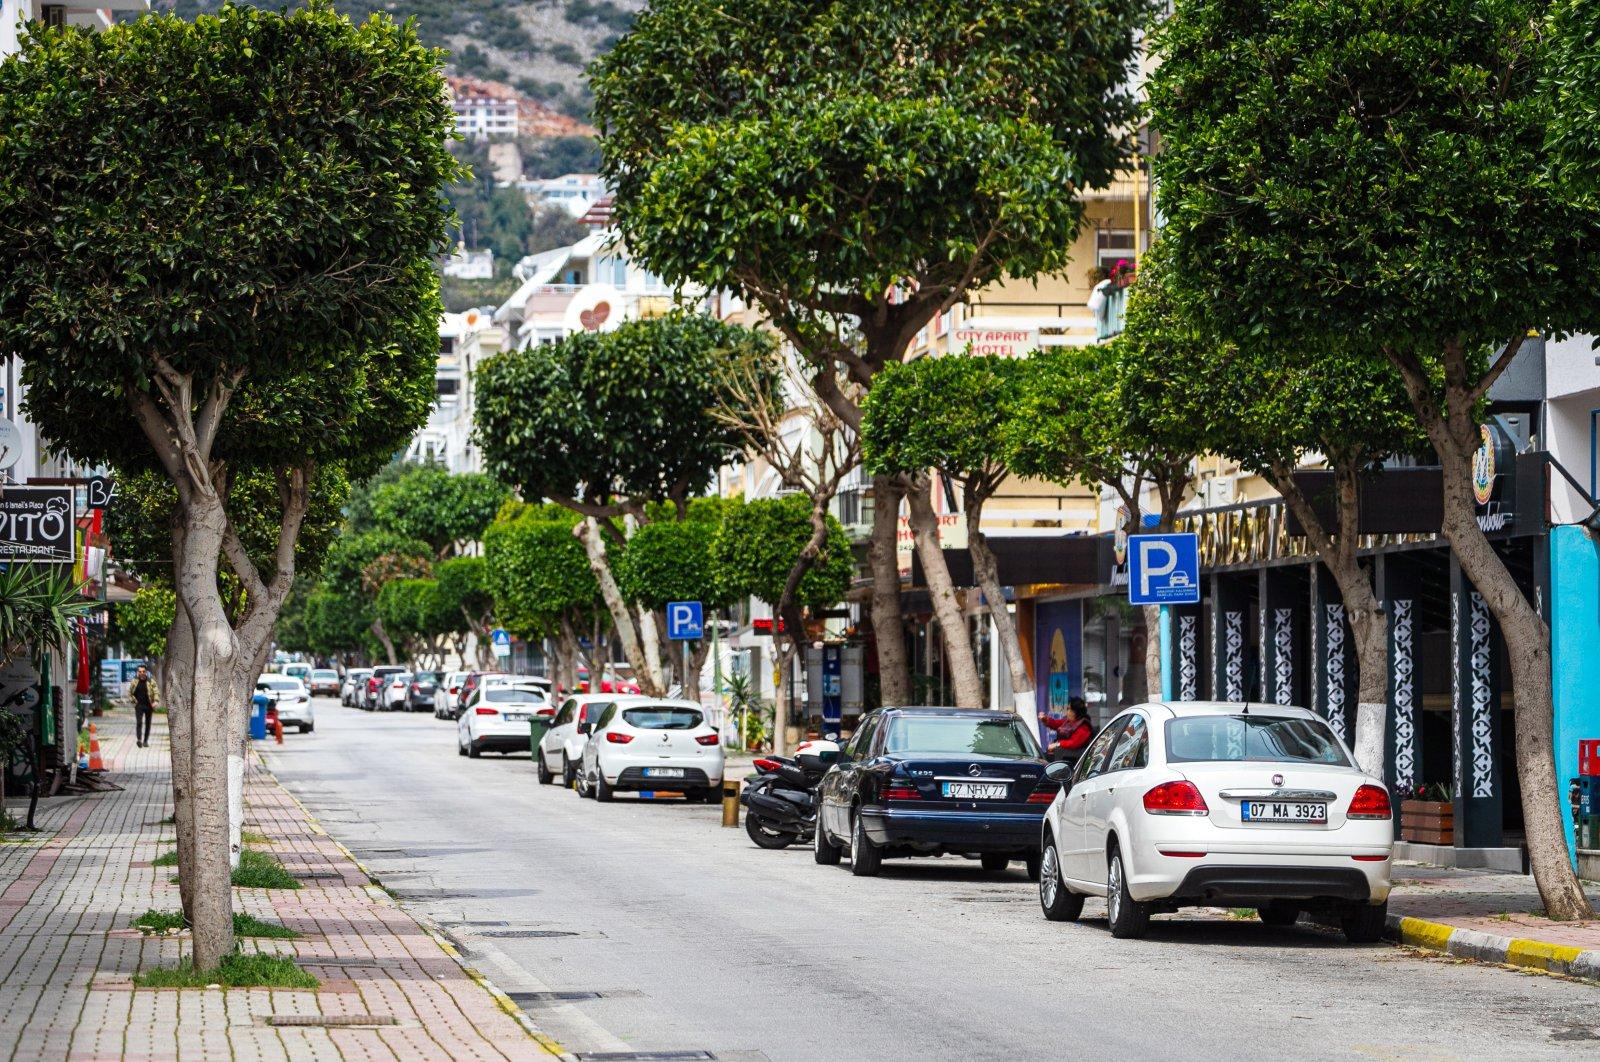 Cars sit parked on a street in Alanya, Antalya, southern Turkey, April 10, 2021. (Shutterstock Photo)